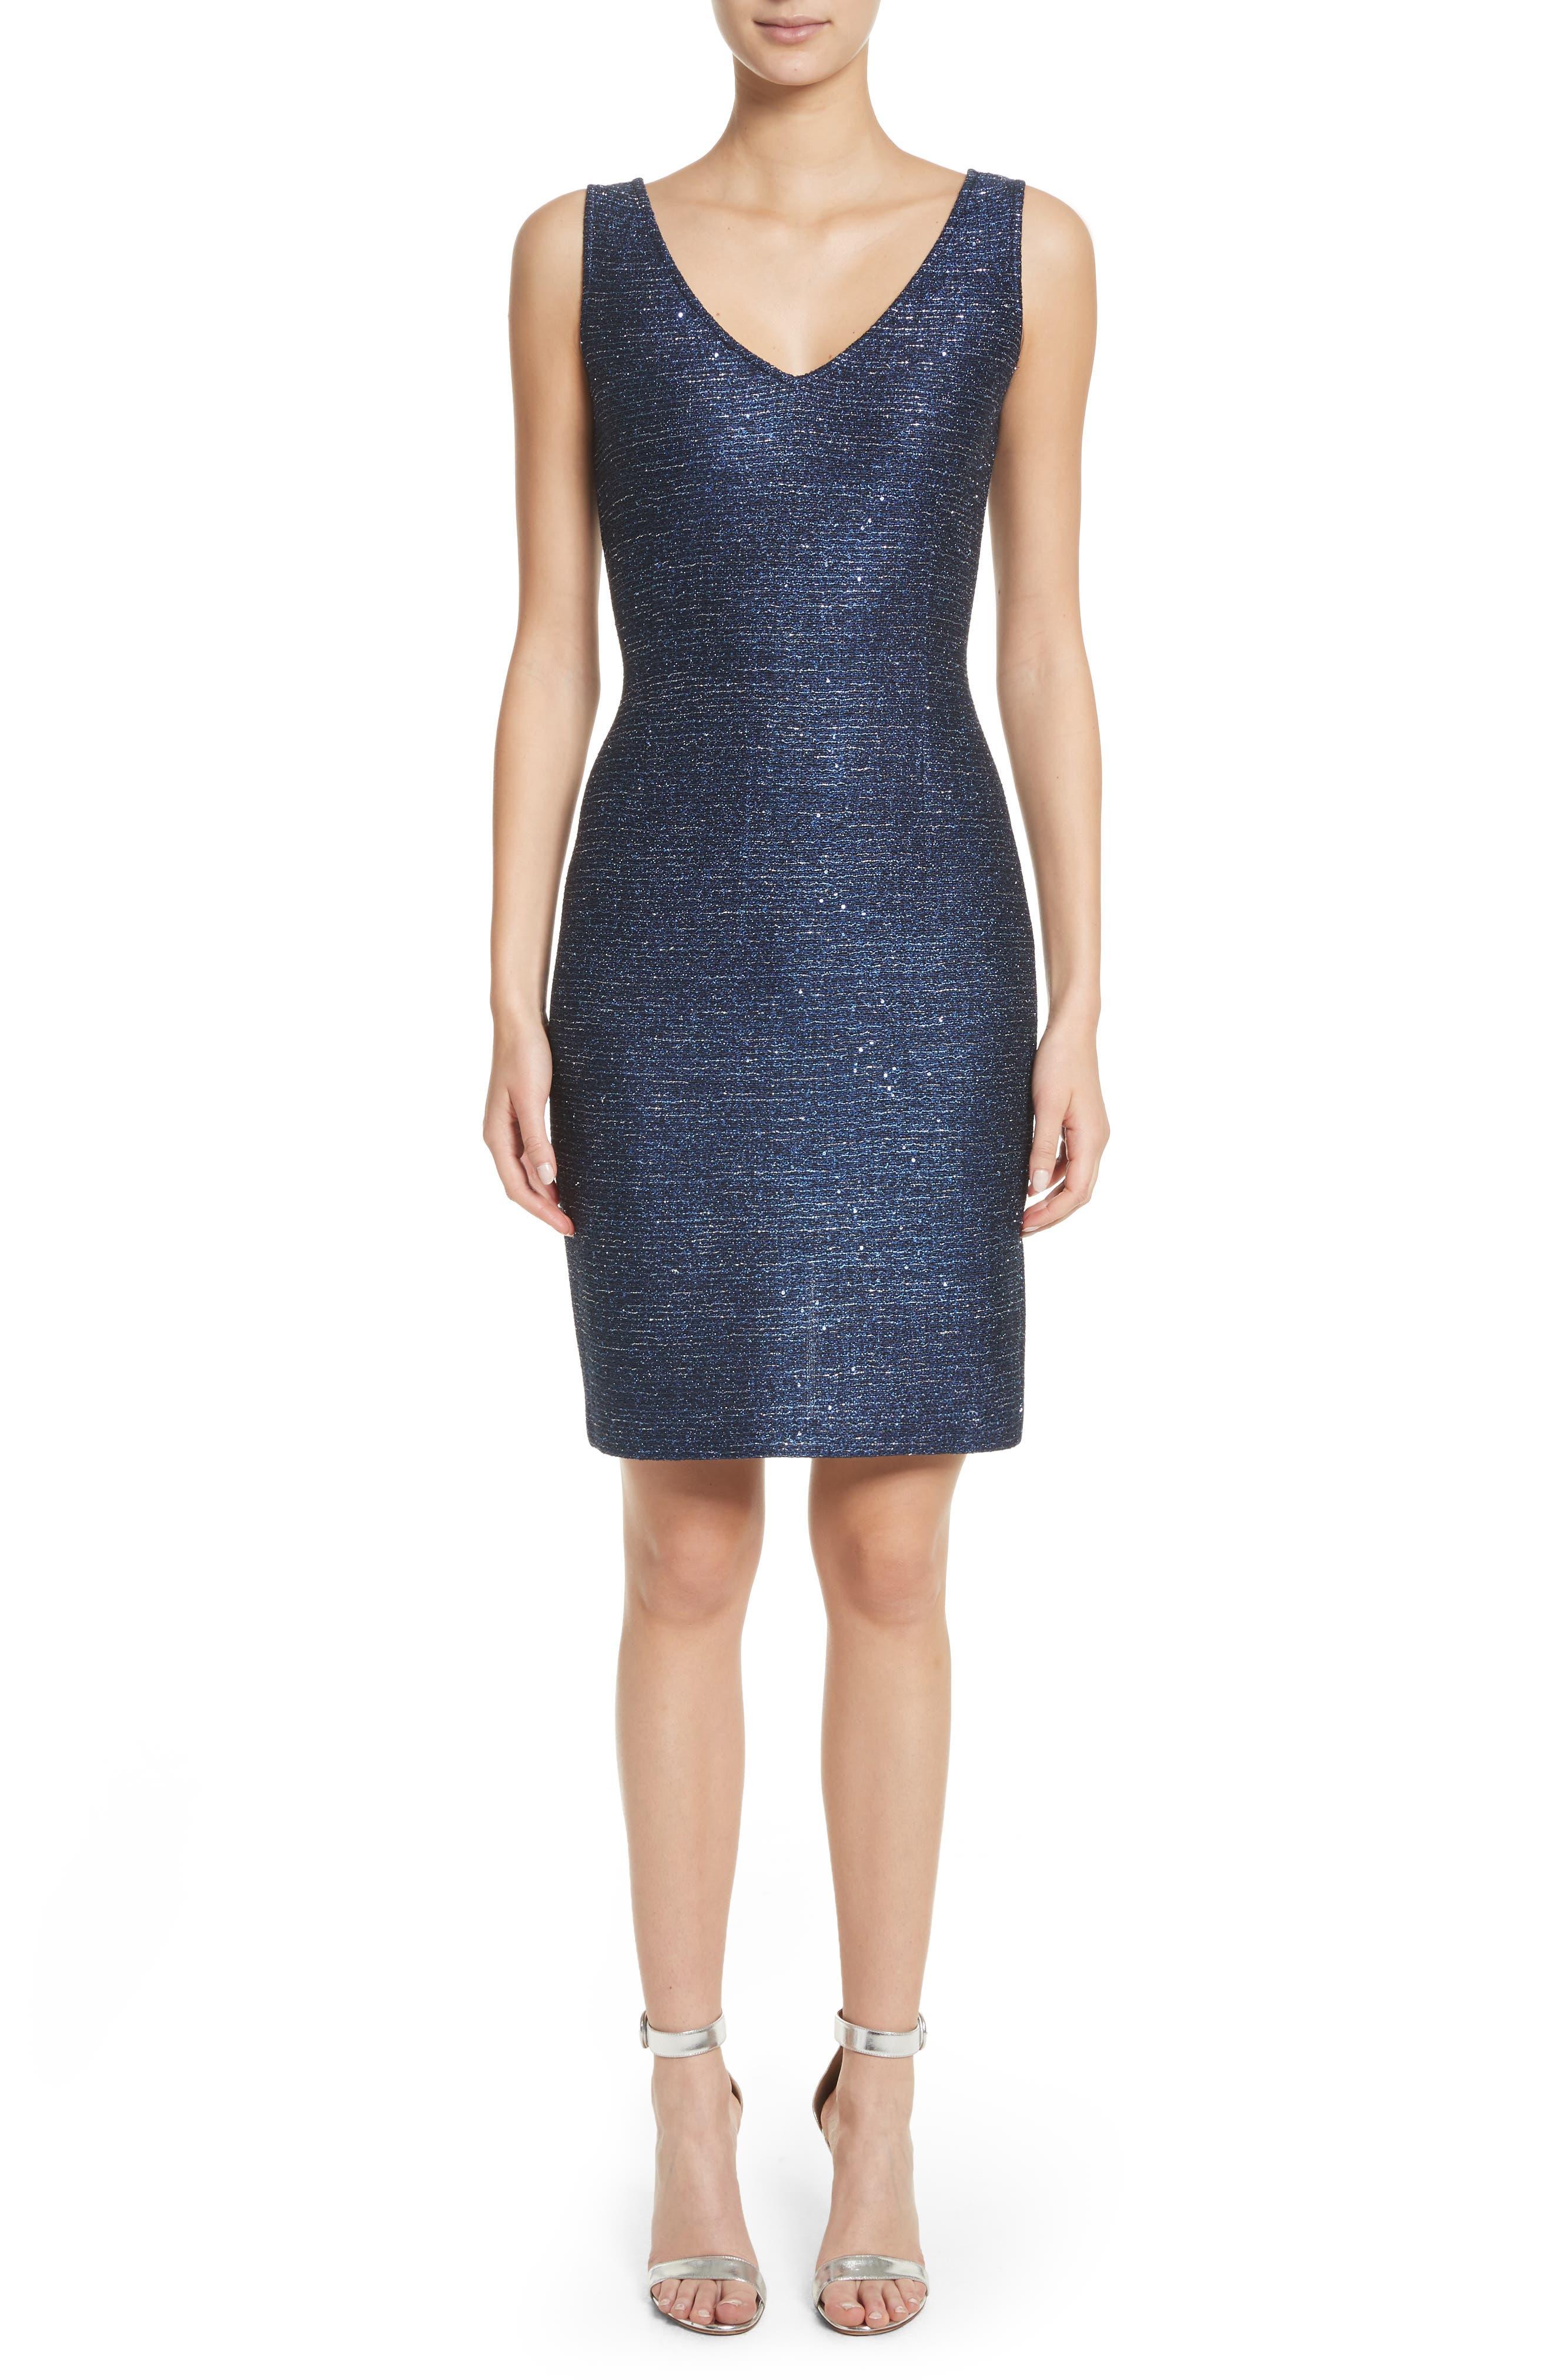 Main Image - St. John Collection Sparkle Knit Sheath Dress